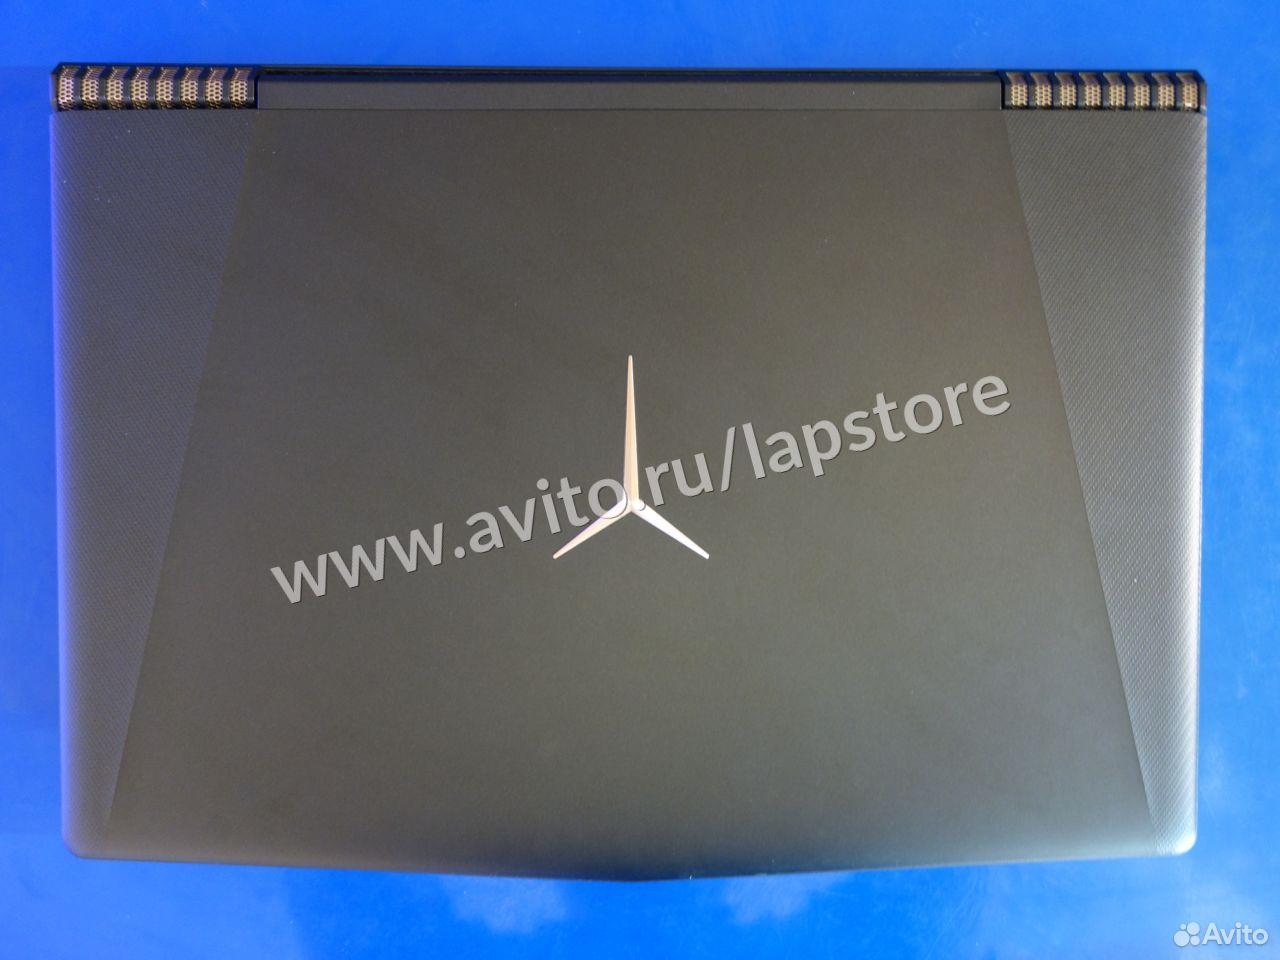 Ноутбук Lenovo Y520 i7-7700HQ/16GB/256+1T/GTX1050  84012422018 купить 5